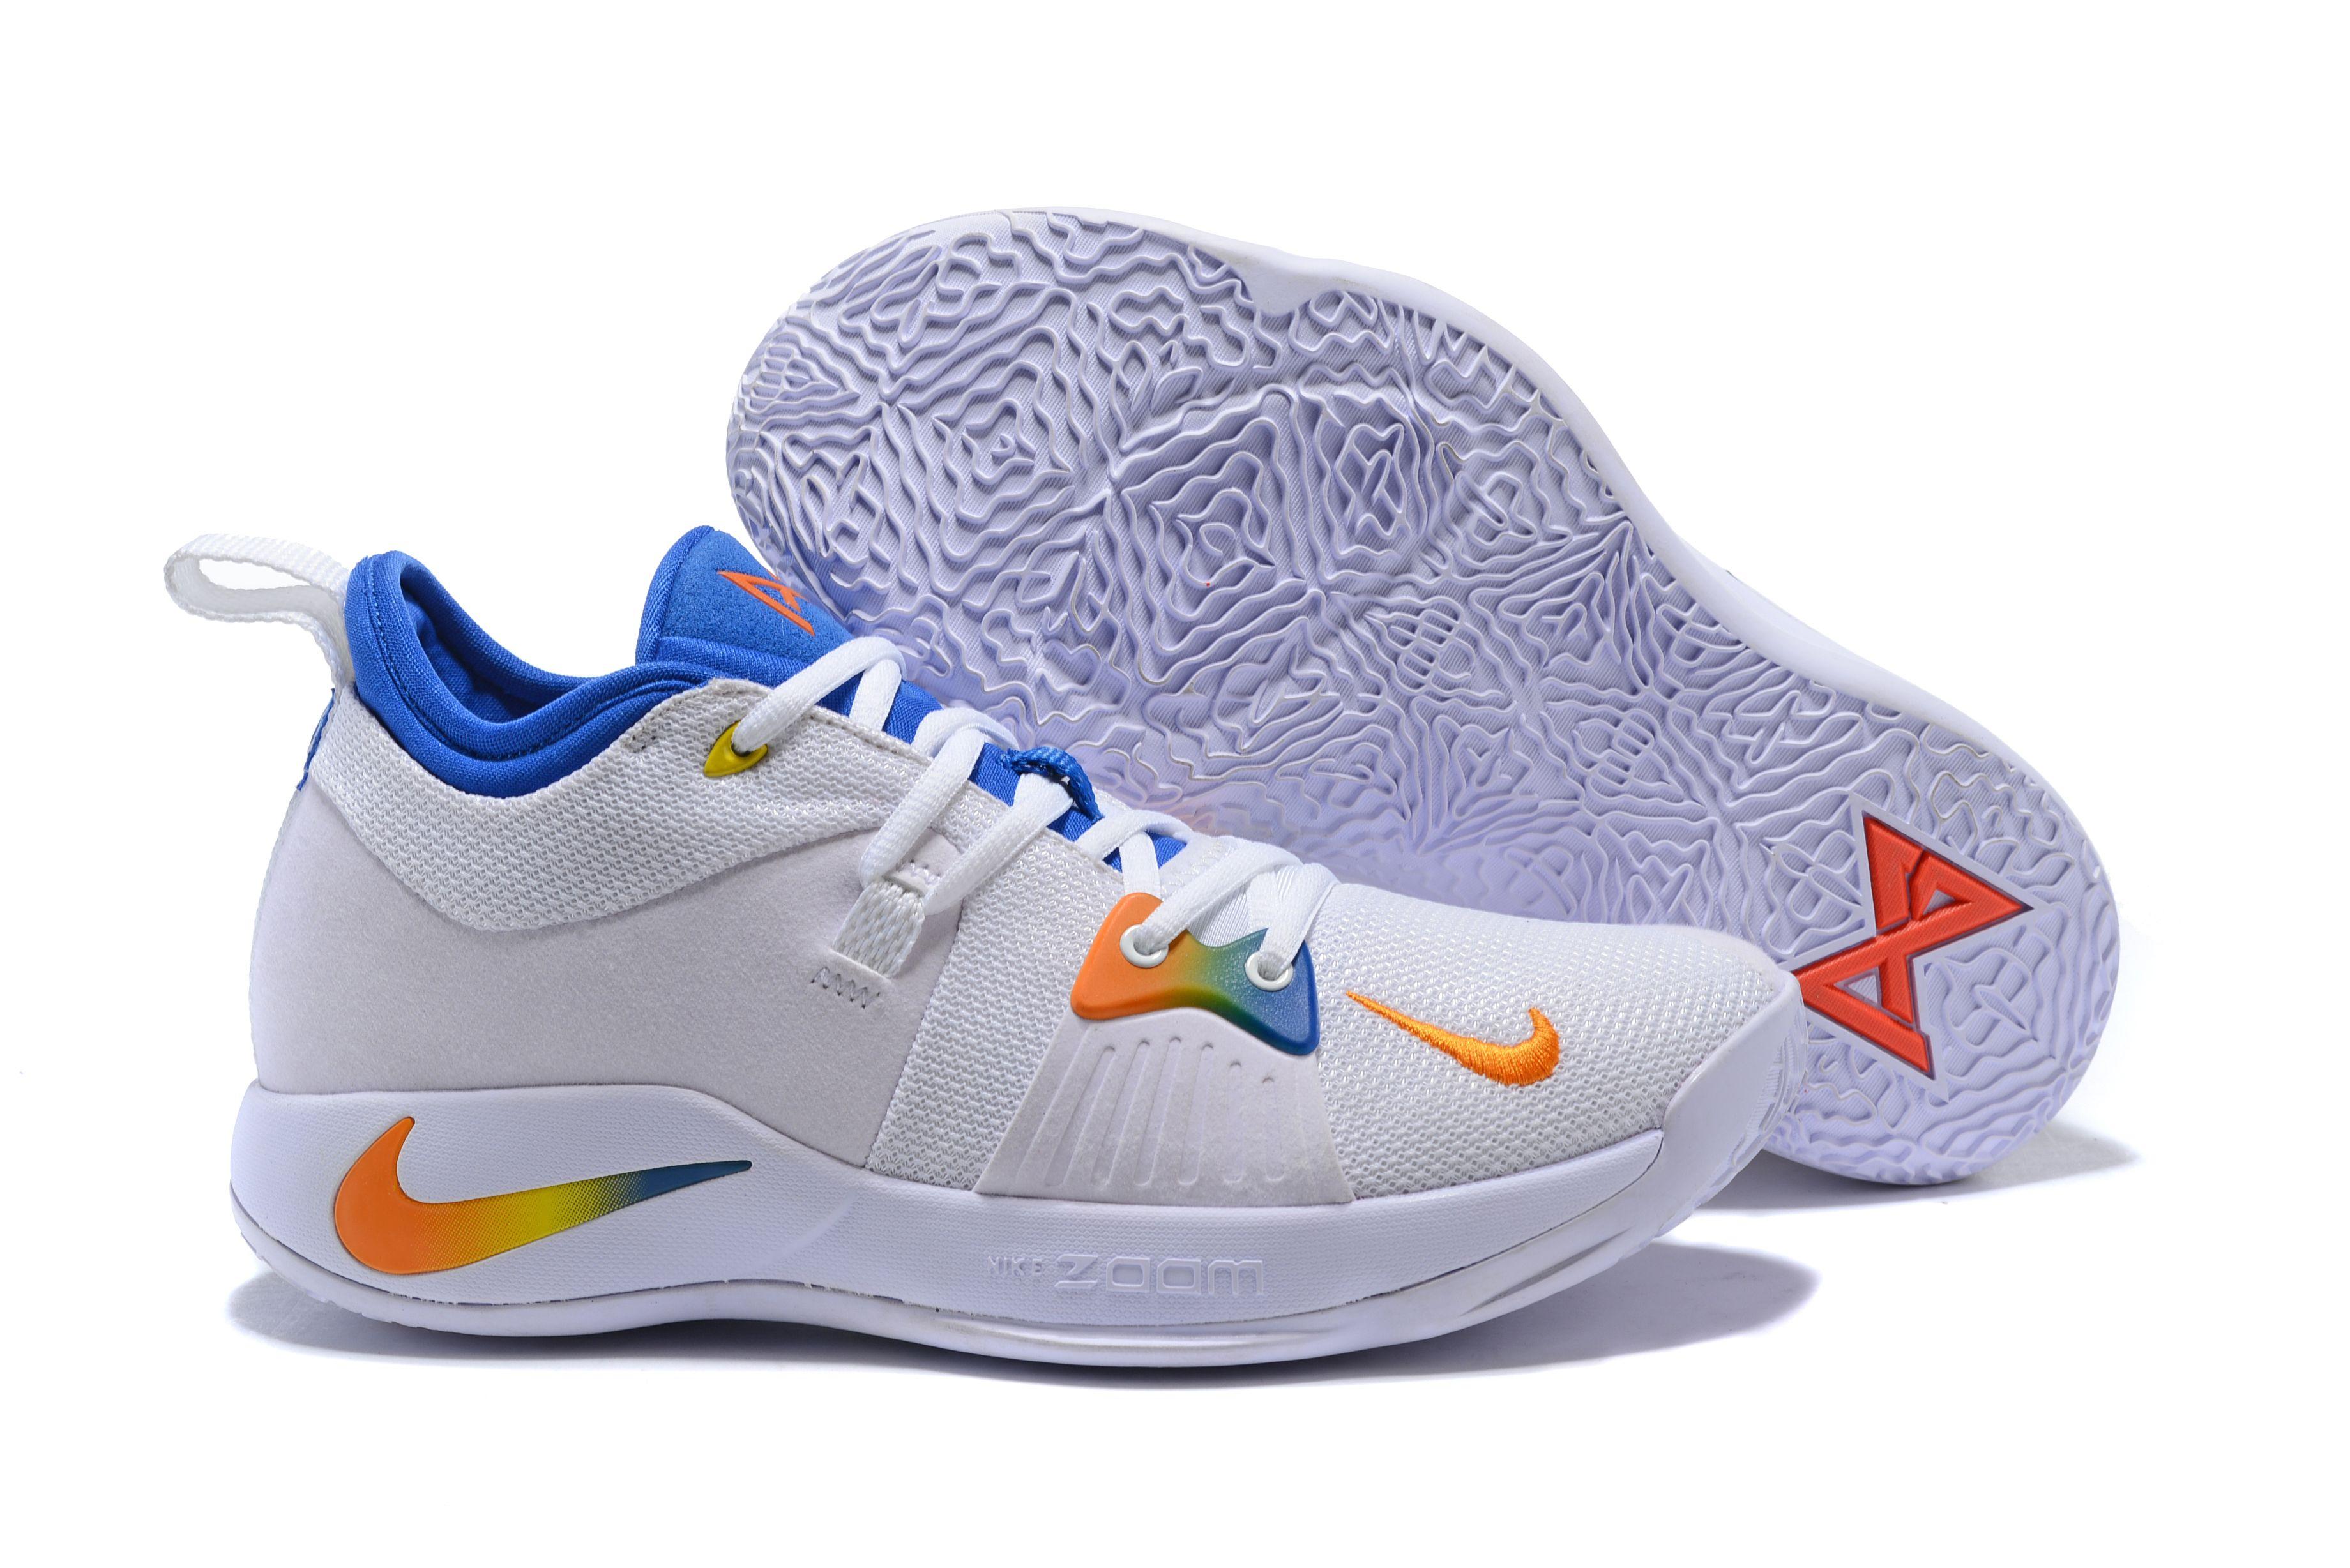 d8697ef581d9d3 Men s Nike PG 2 White Blue Orange Paul George Basketball Shoes ...